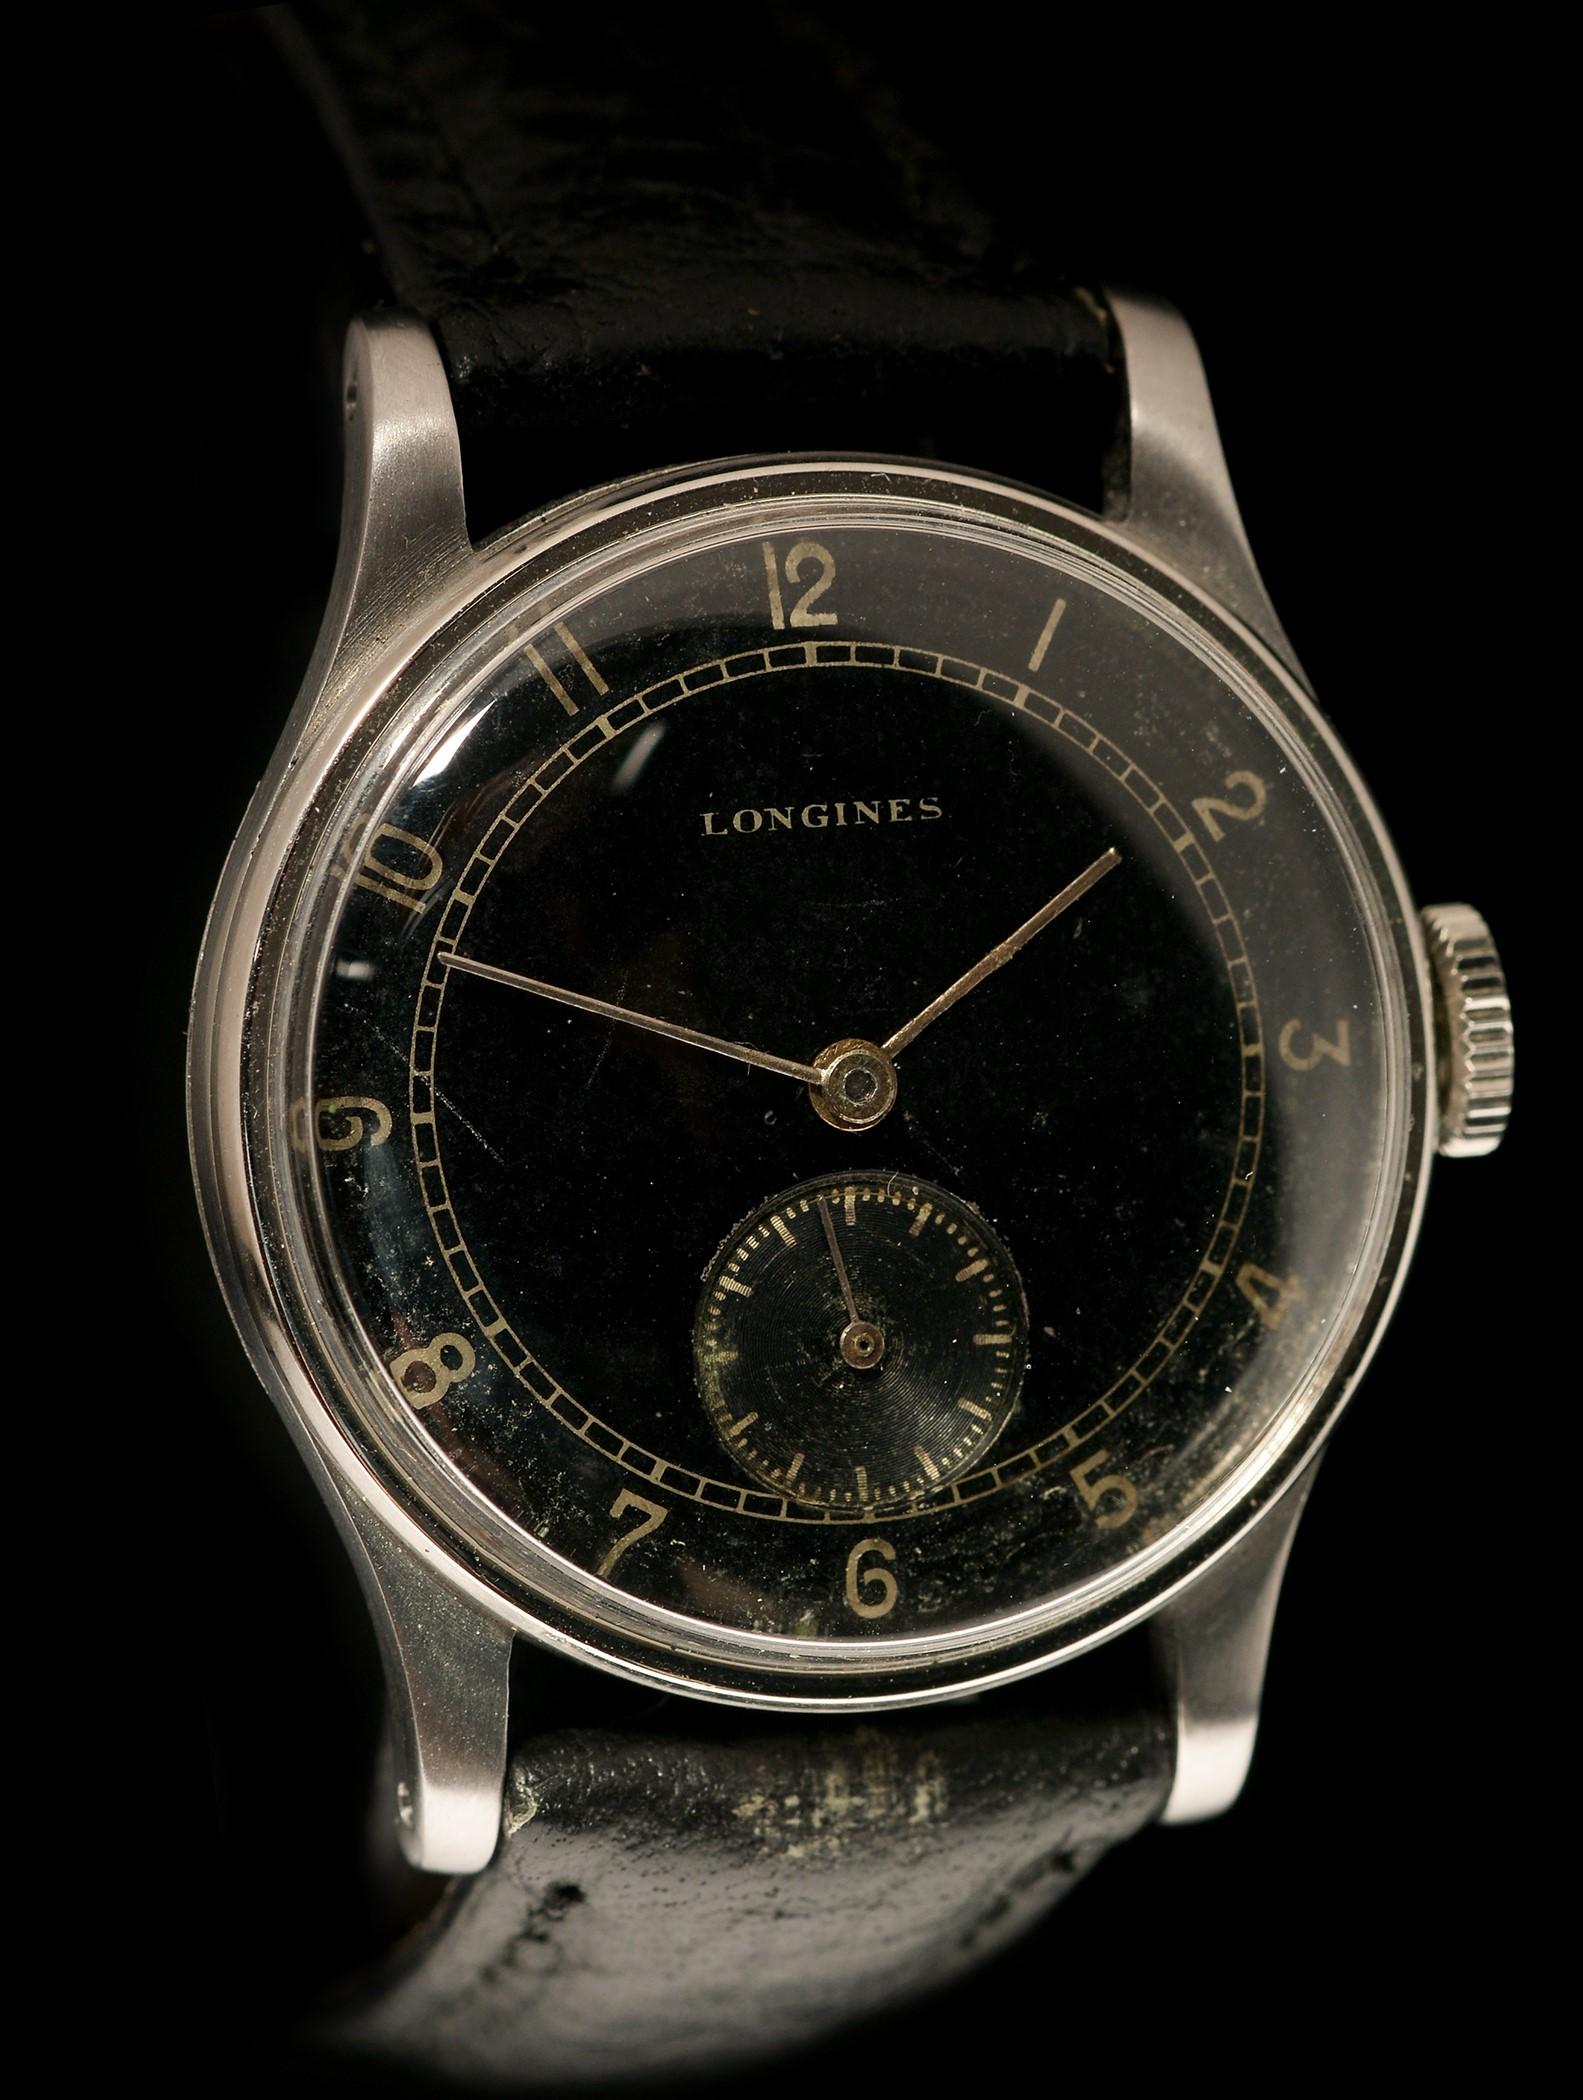 Lot 21 - Longines manual wind wristwatch